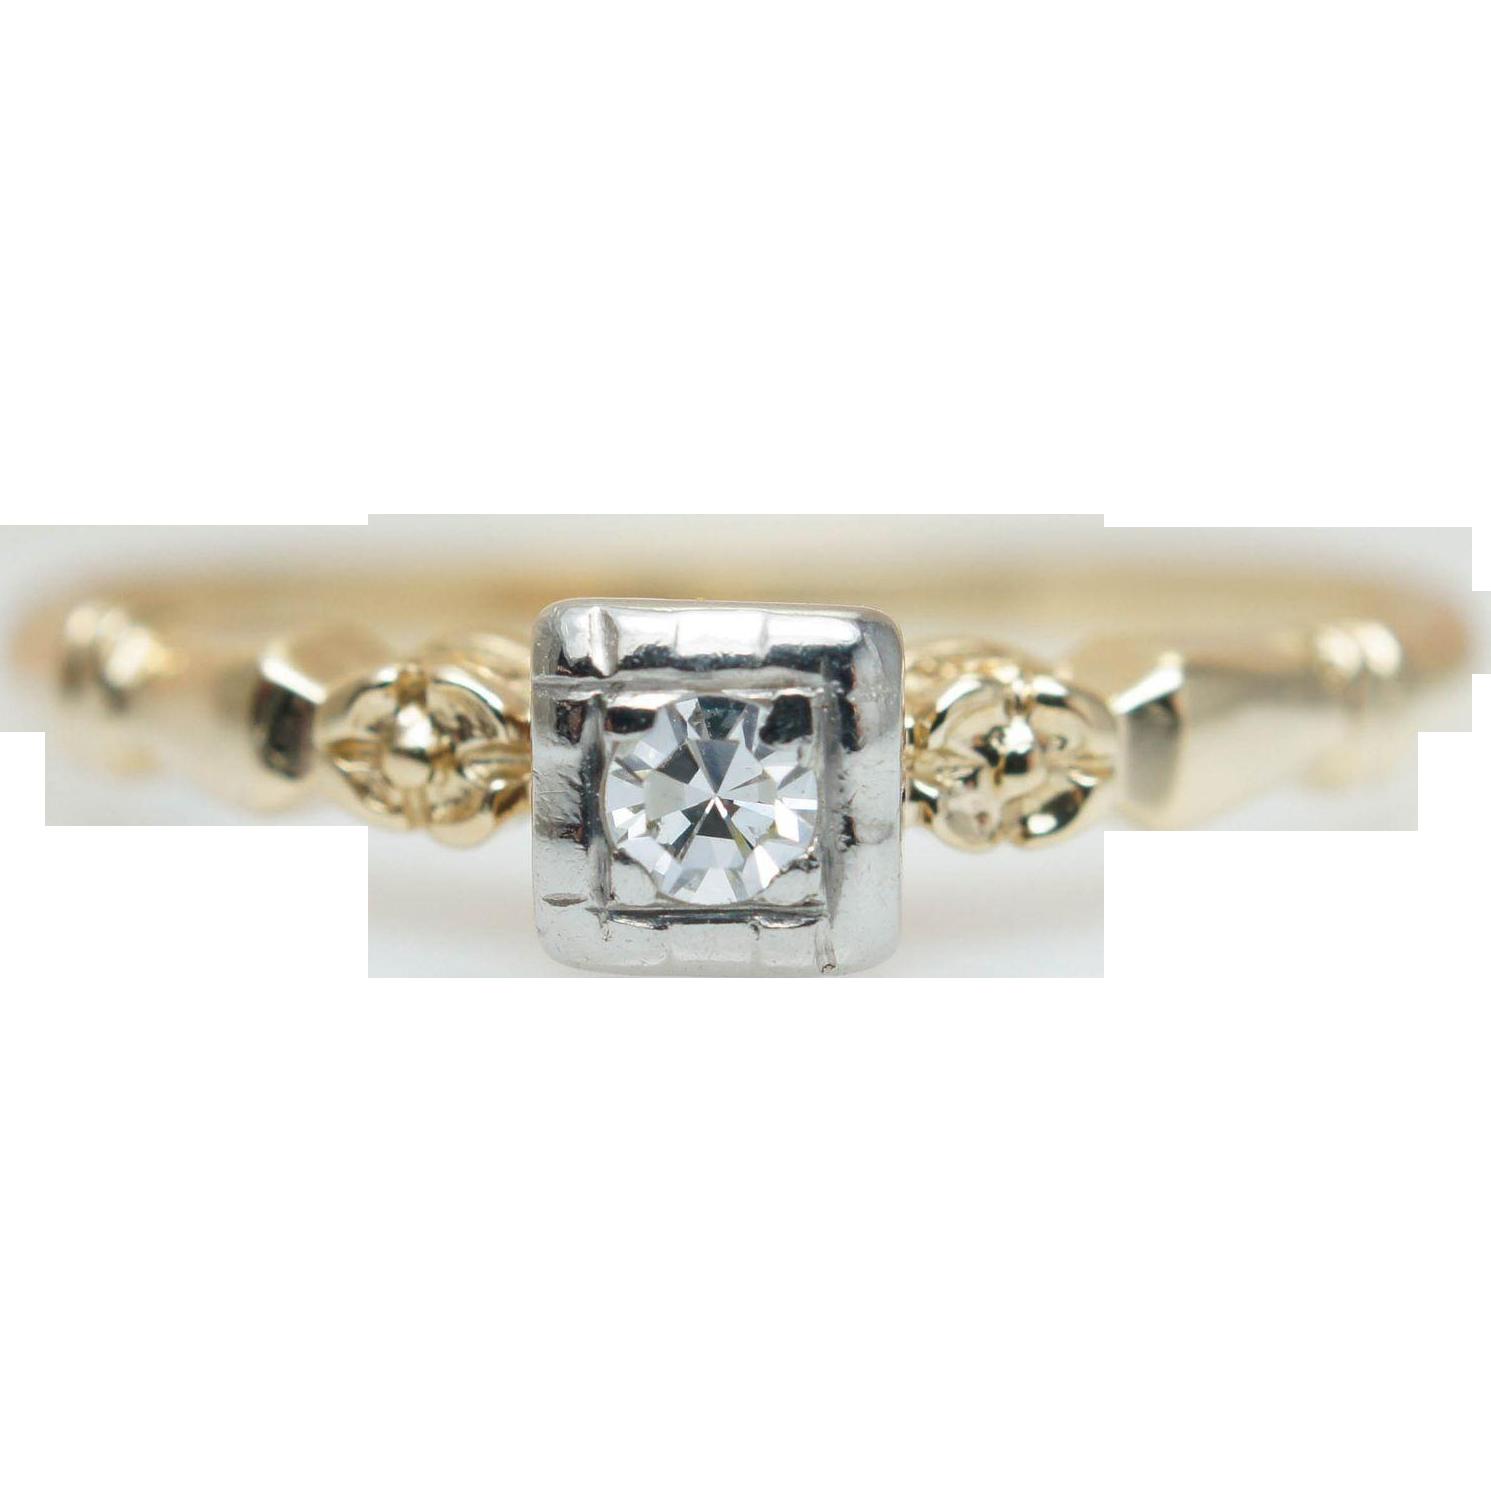 Vintage Single Cut Diamond Engagement Ring 14k Yellow Gold Wedding Band Ring